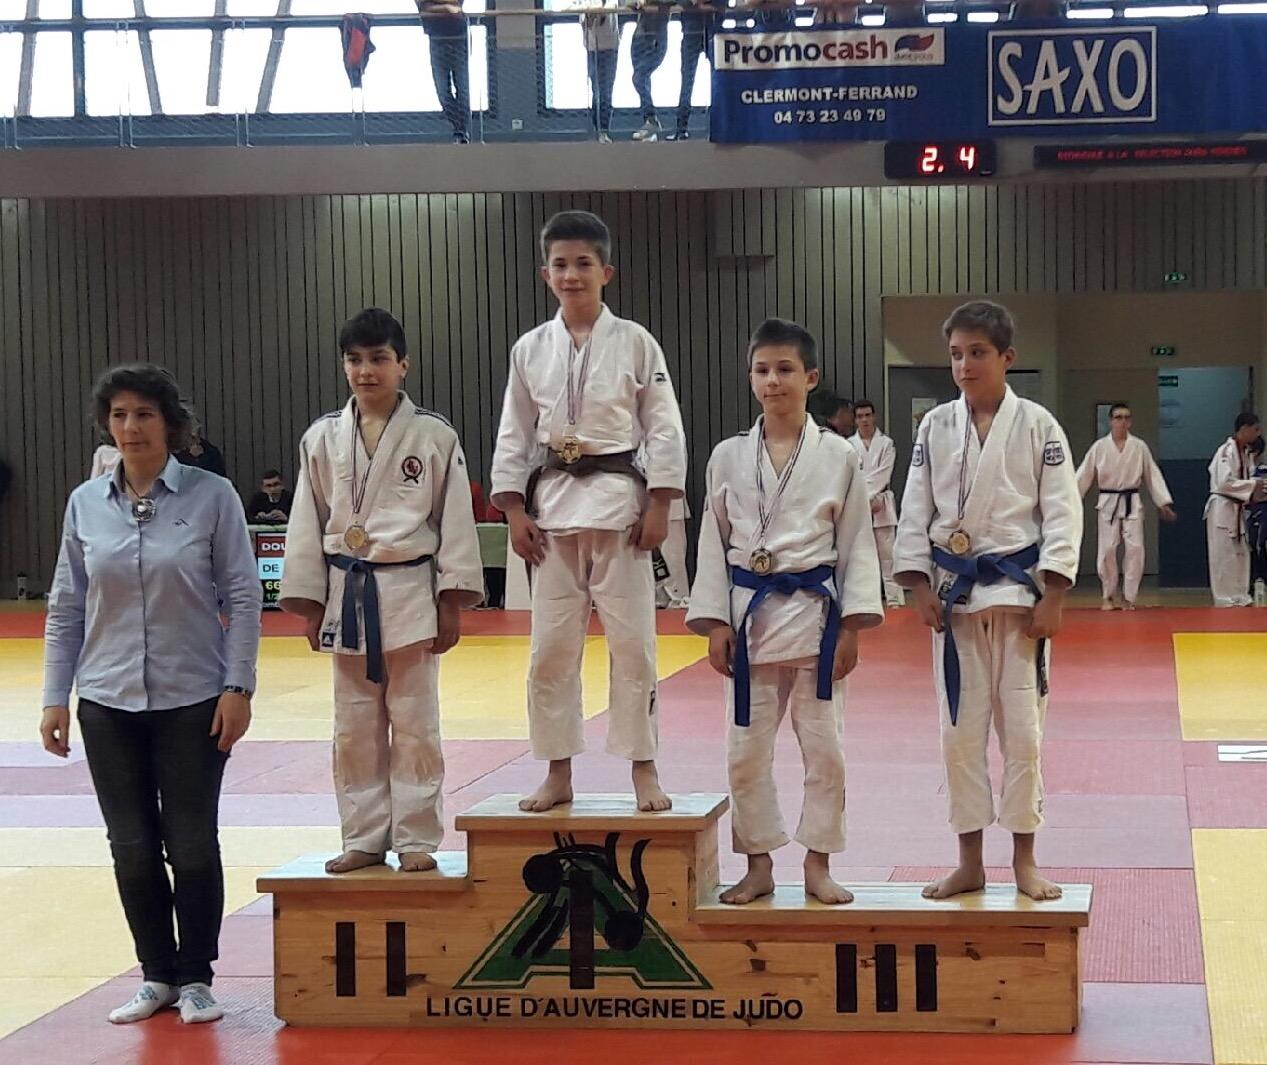 club judo clermont ferrand